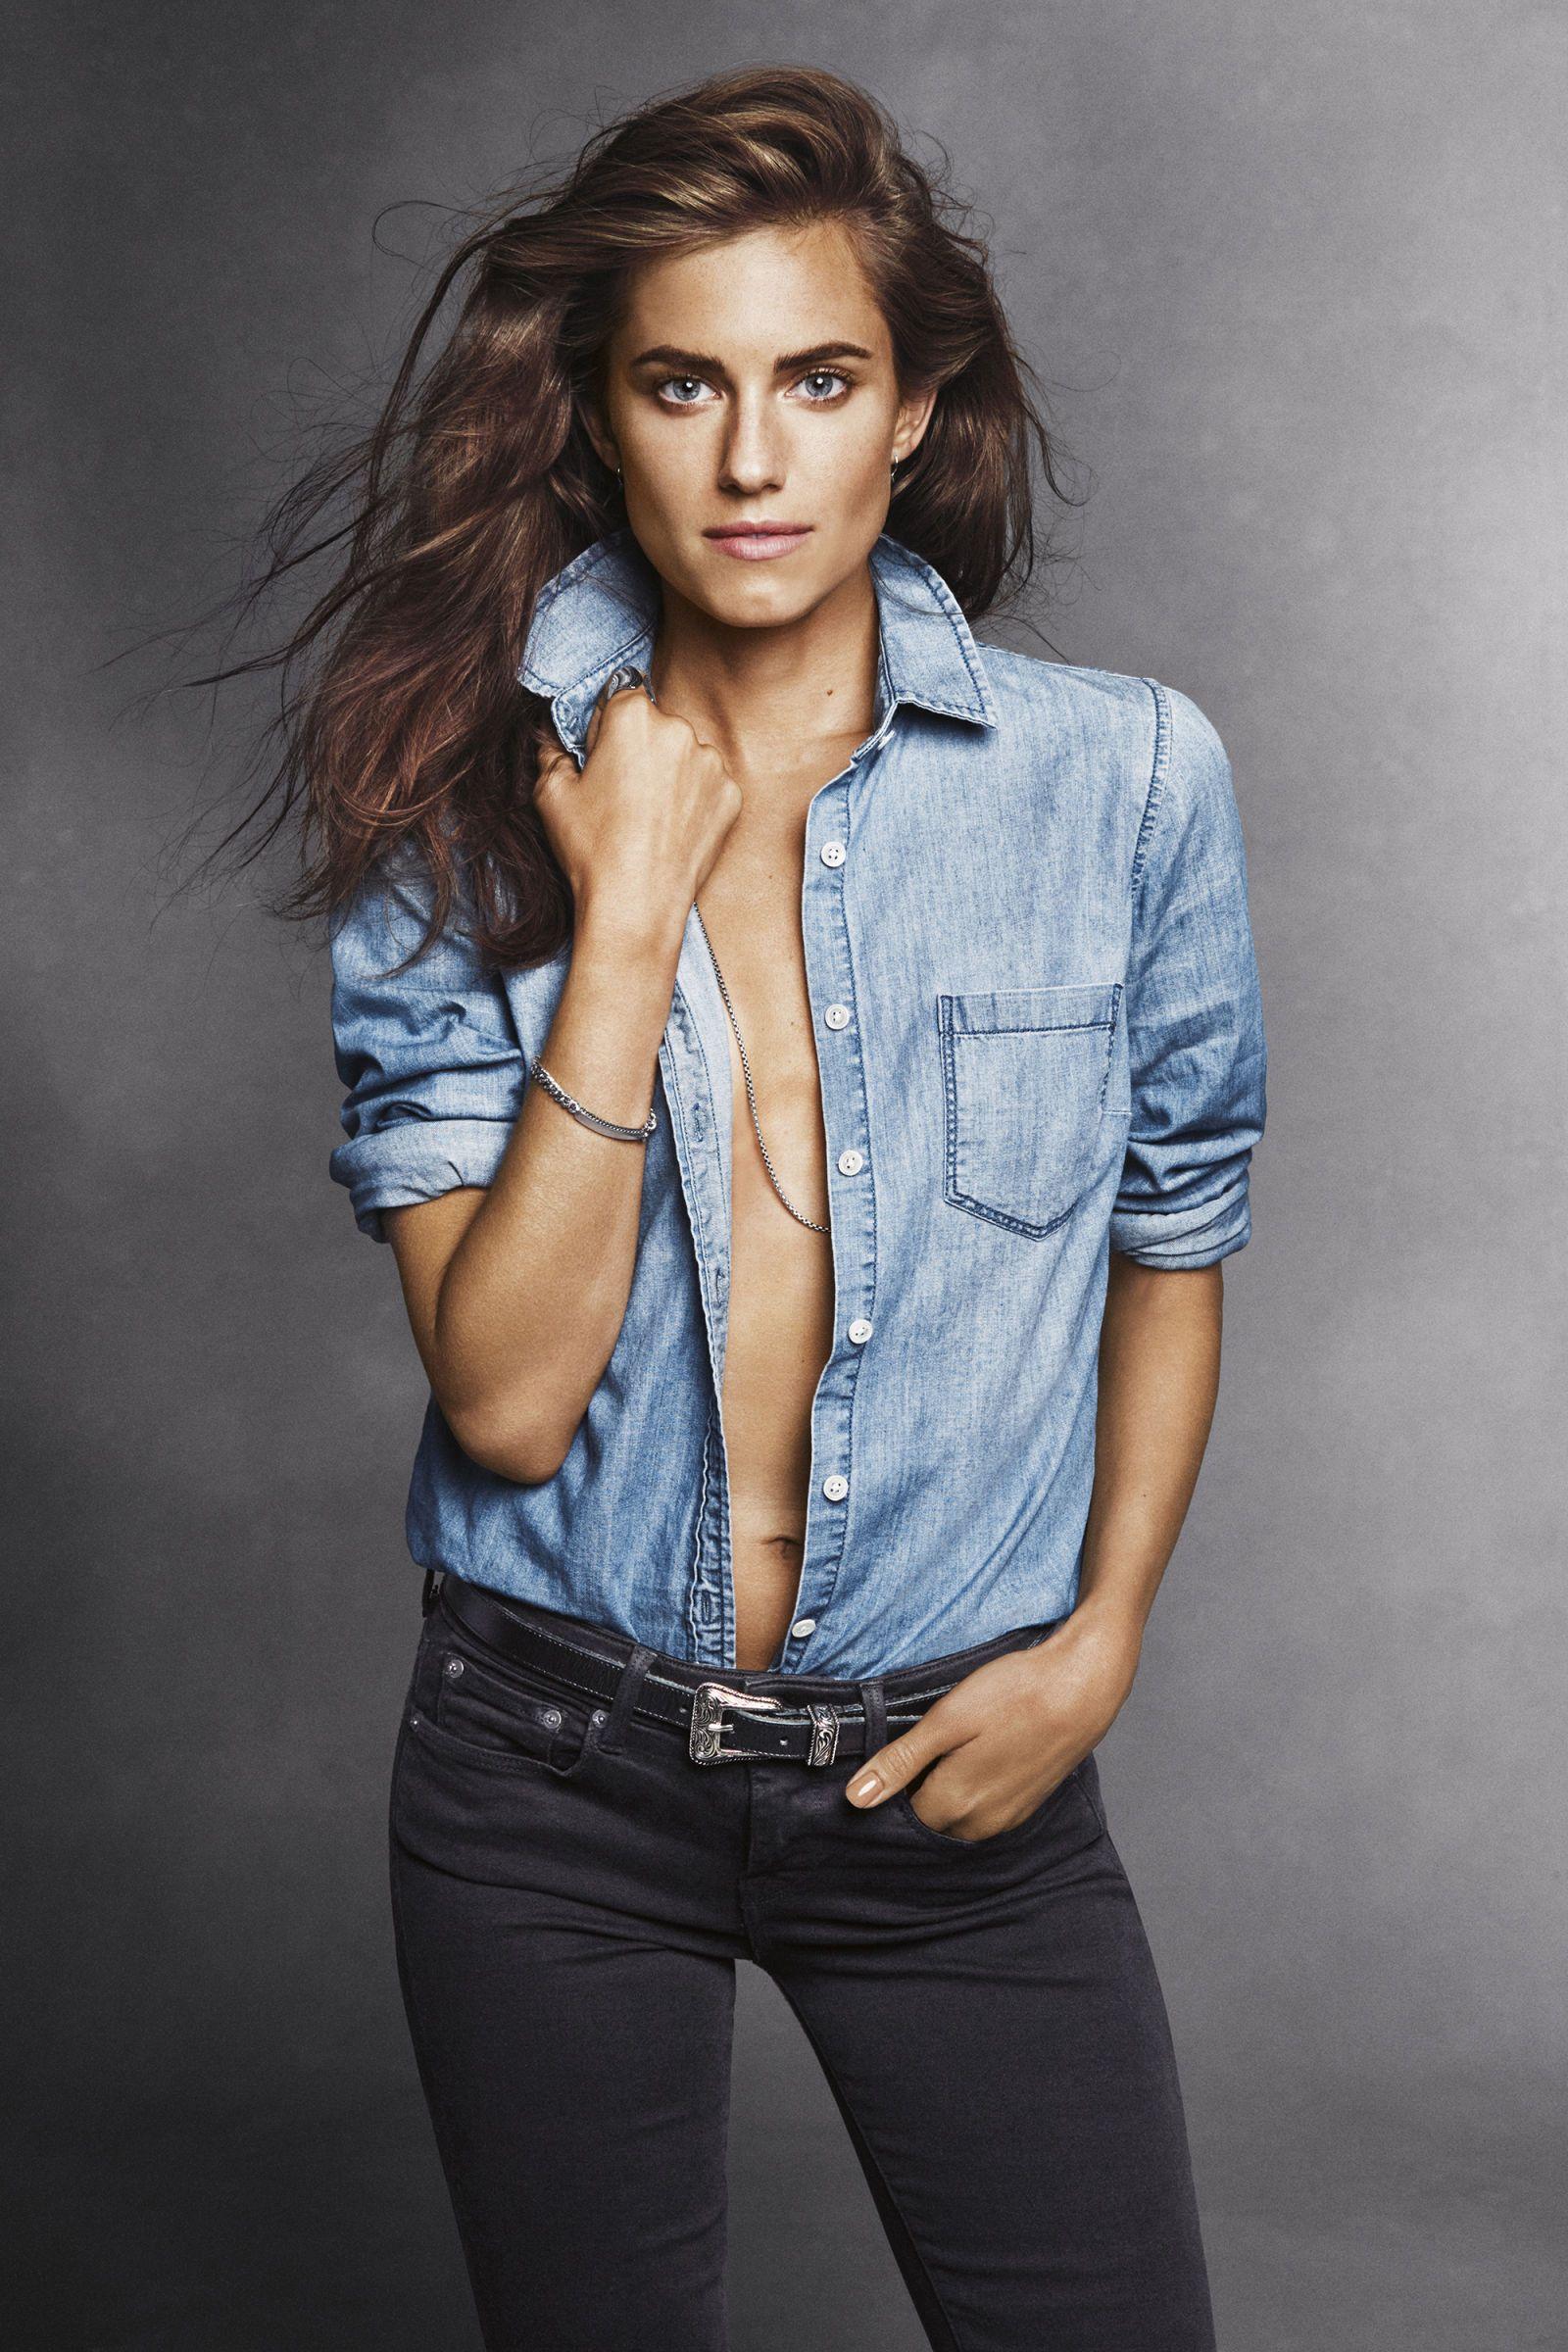 Allison Williams For Harper: The Fashion Shoot